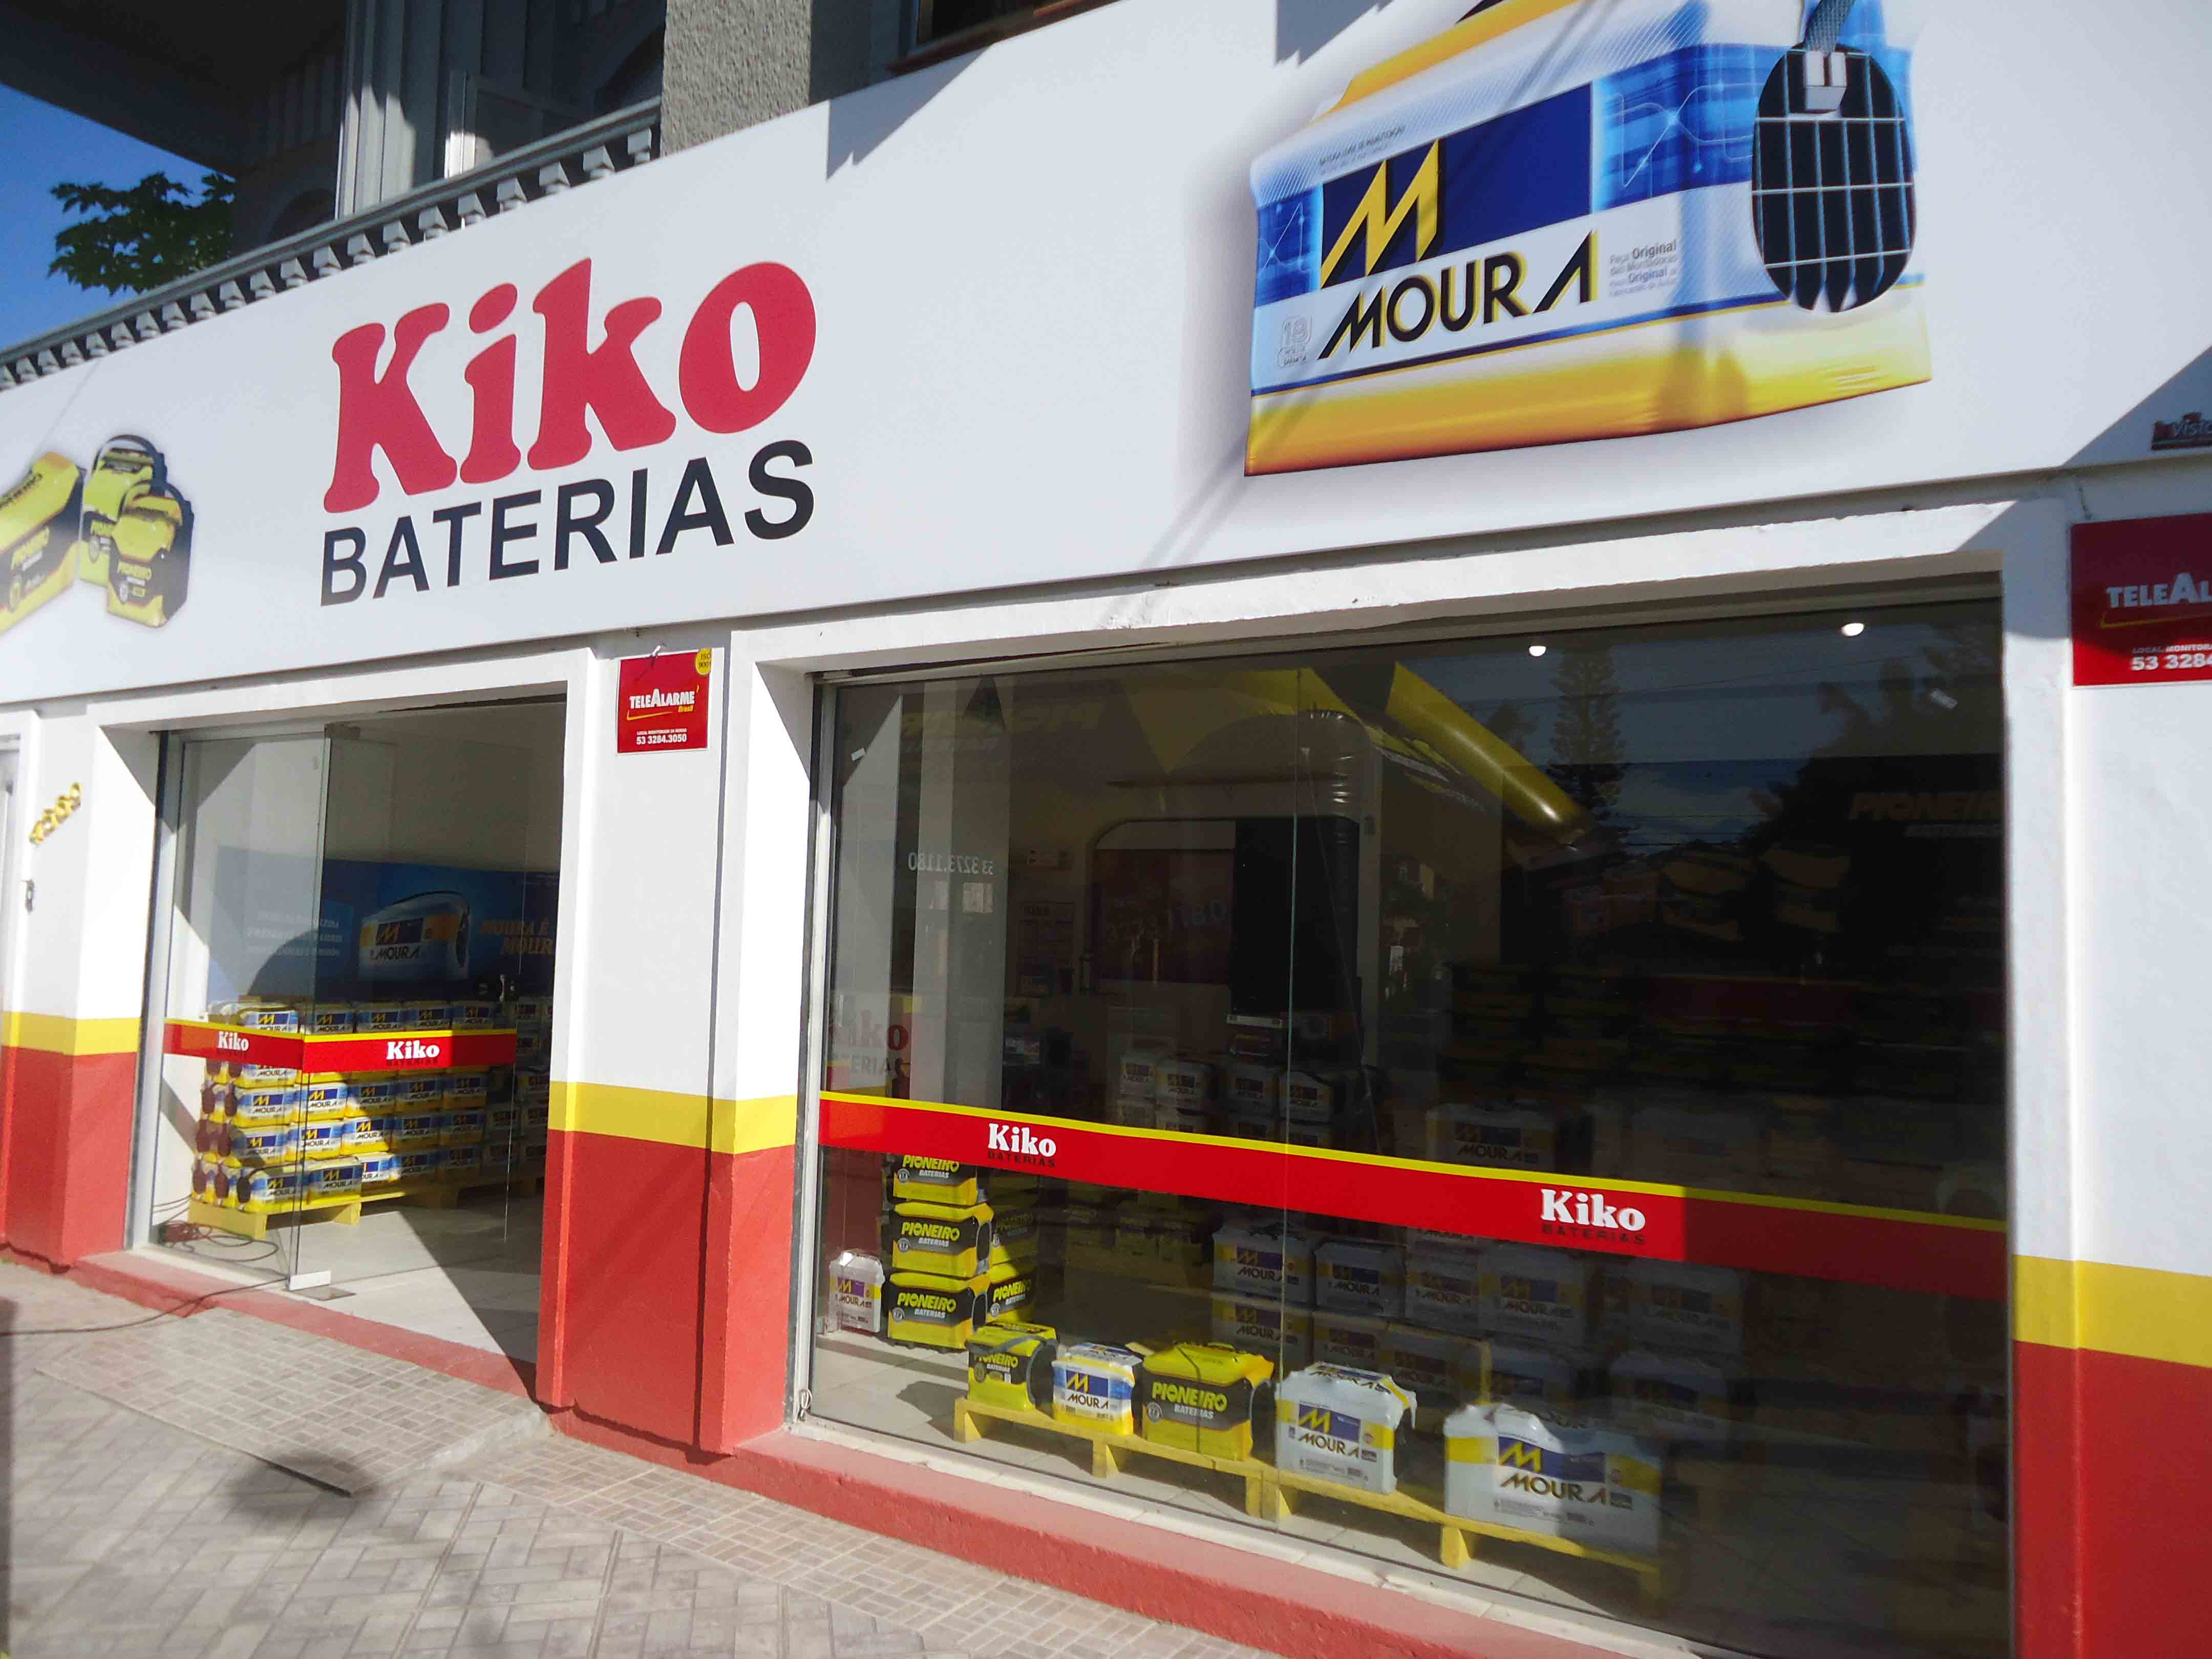 Kiko Baterias Tres Vendas